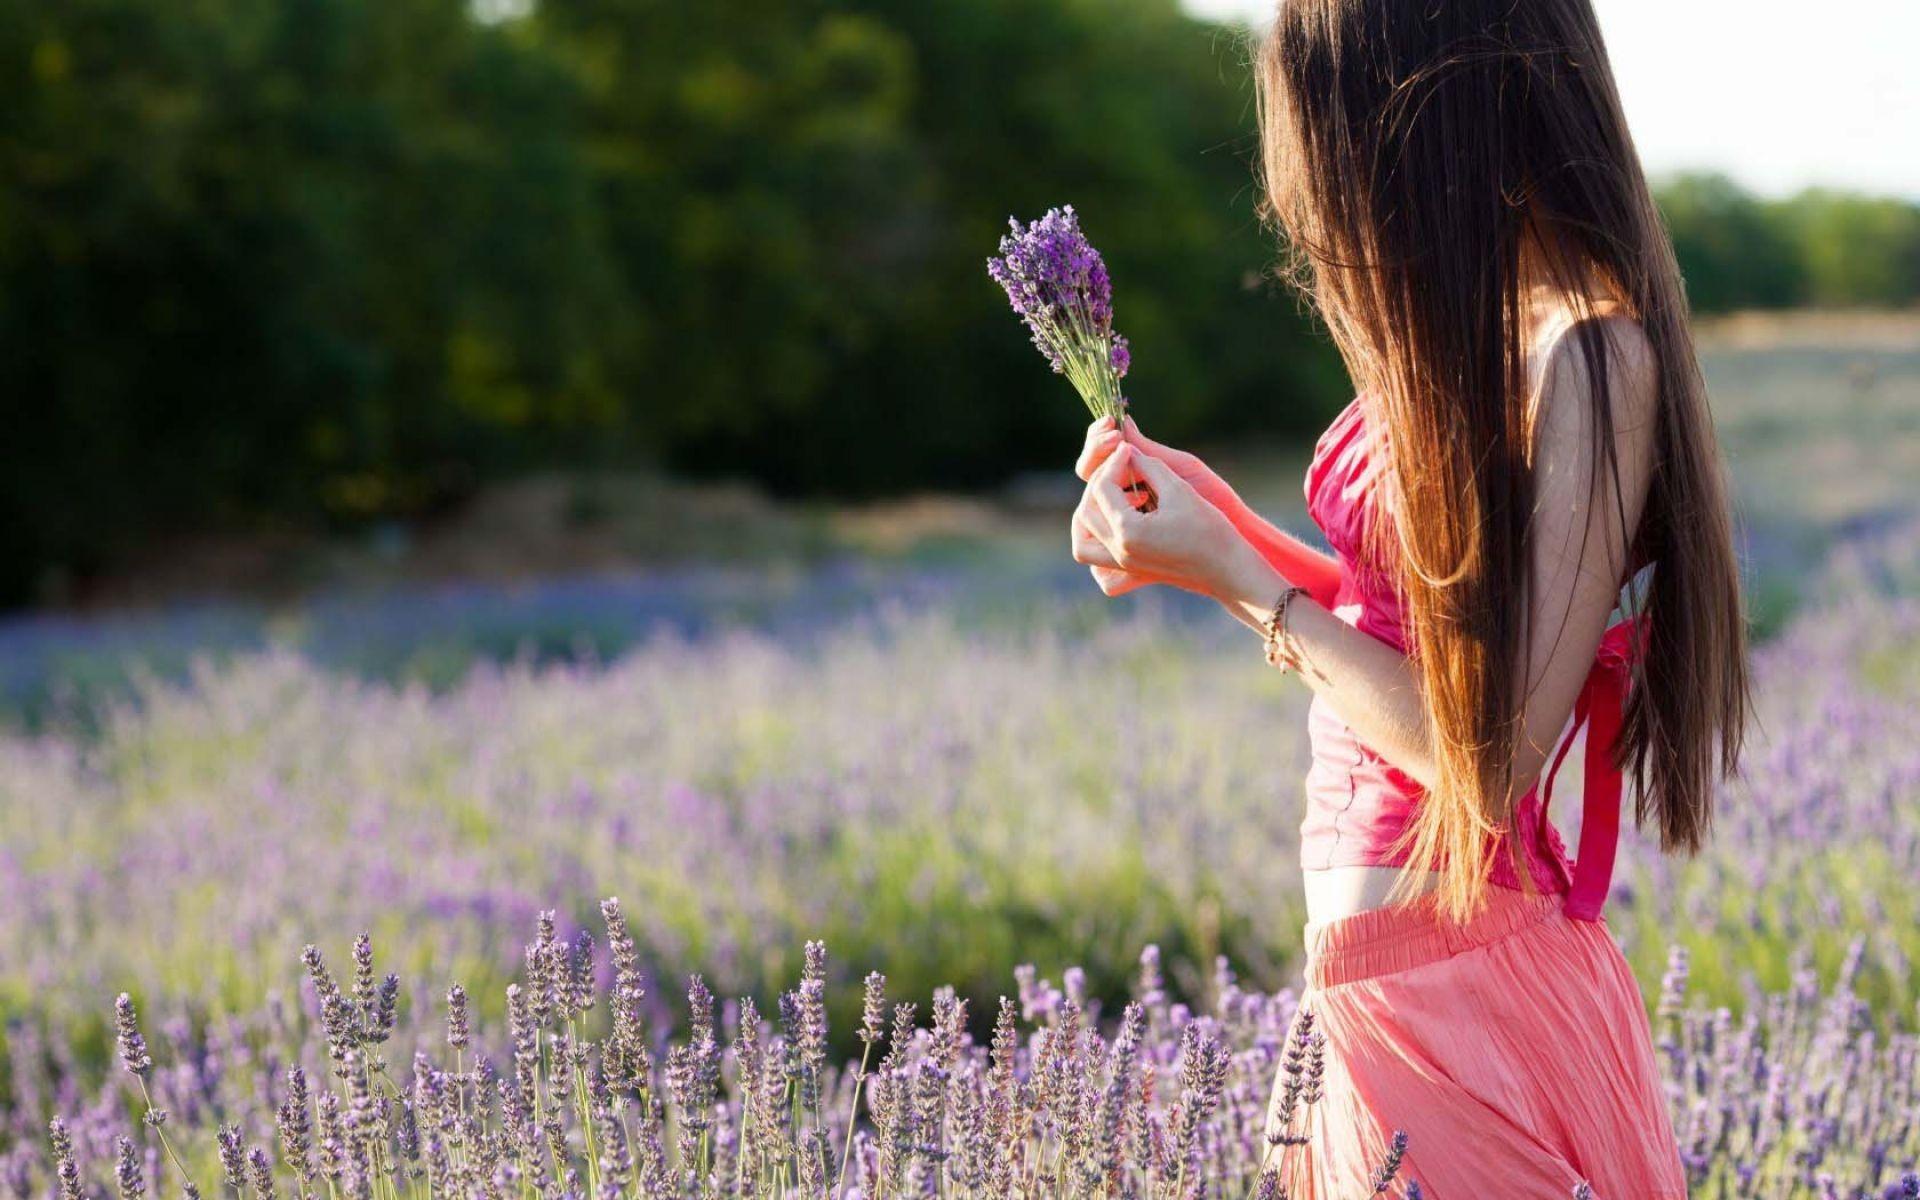 Res: 1920x1200, Mood Girl Field Flowers Purple Nature Wallpaper | HD Love Wallpaper Free  Download ...